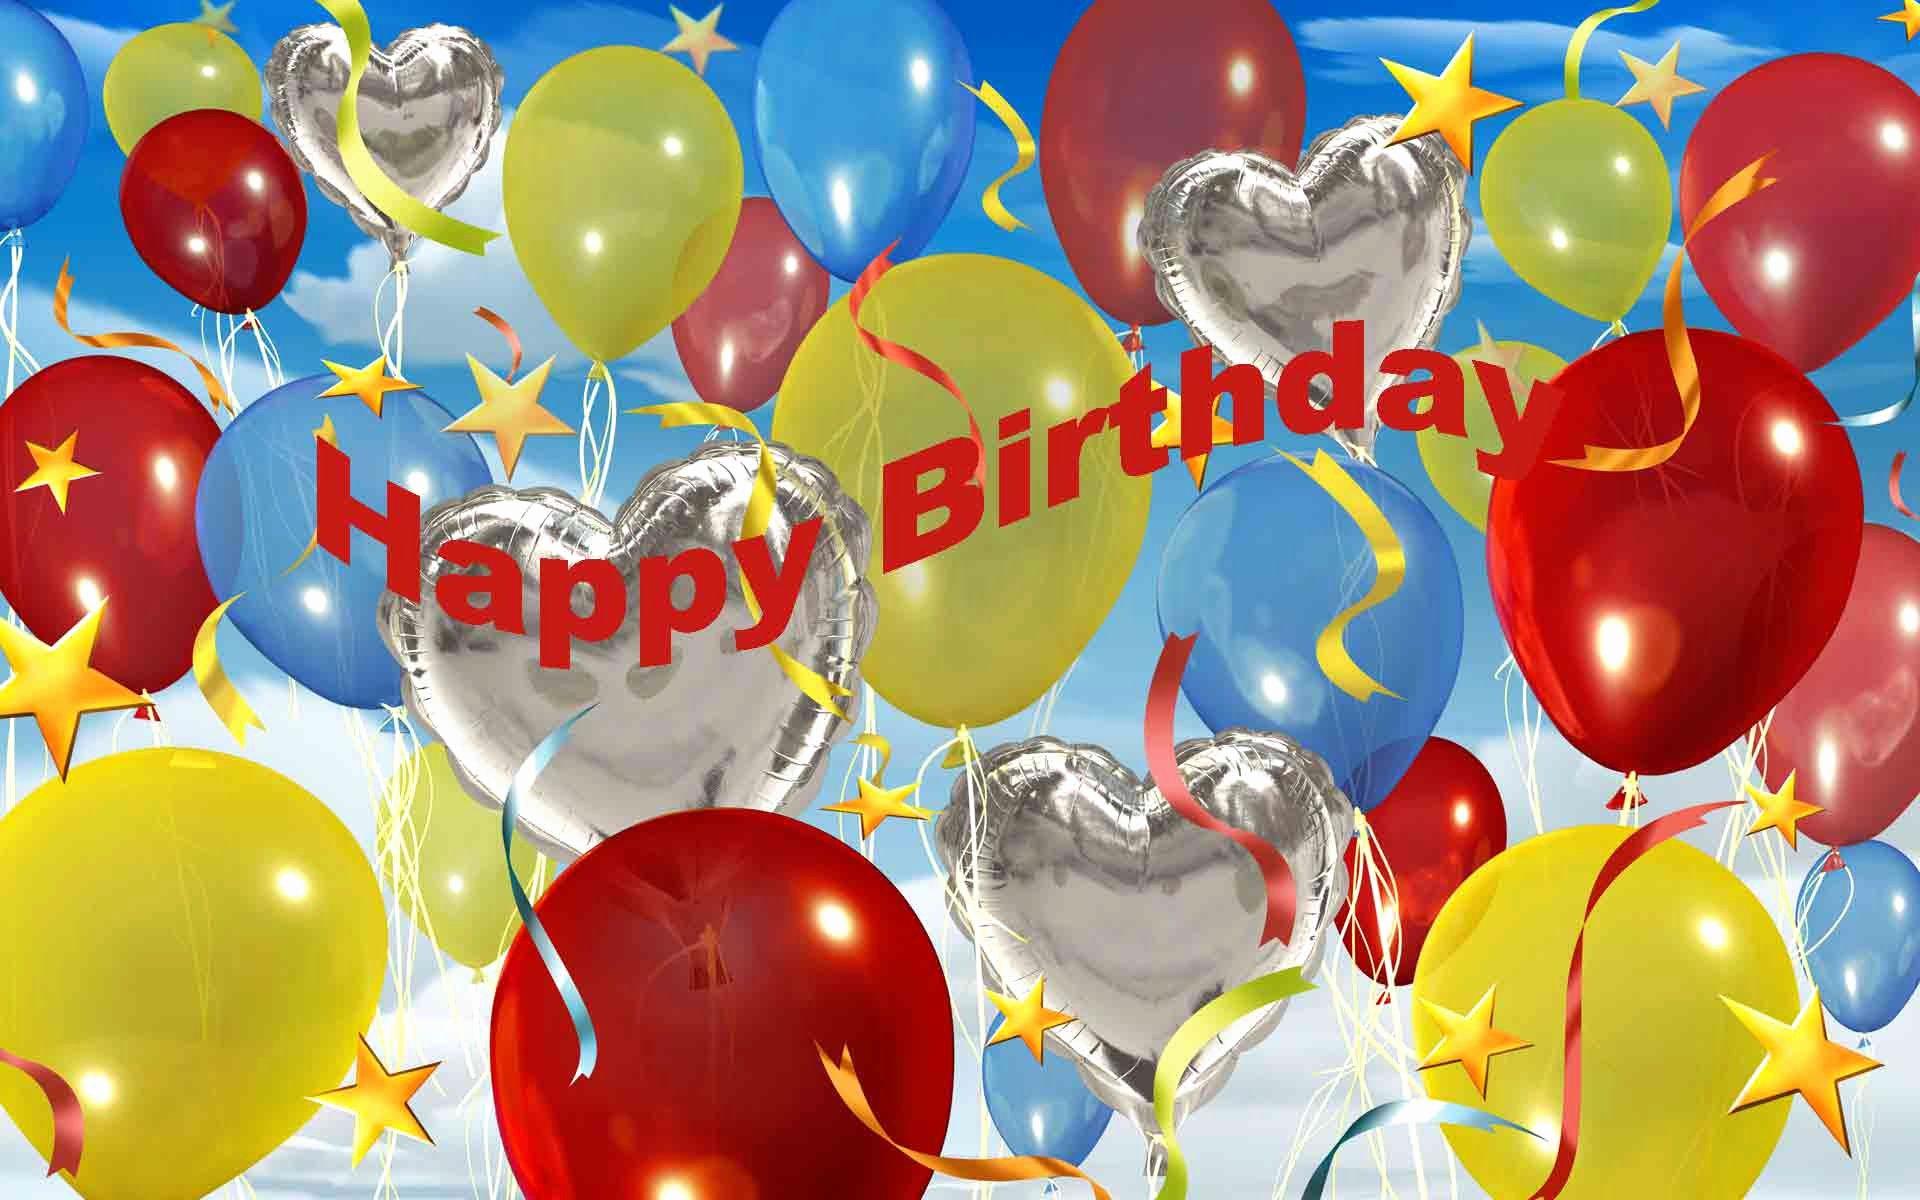 Happy Bday Wallpapers Free Luxury Happy Birthday Wallpapers Free Wallpaper Cave